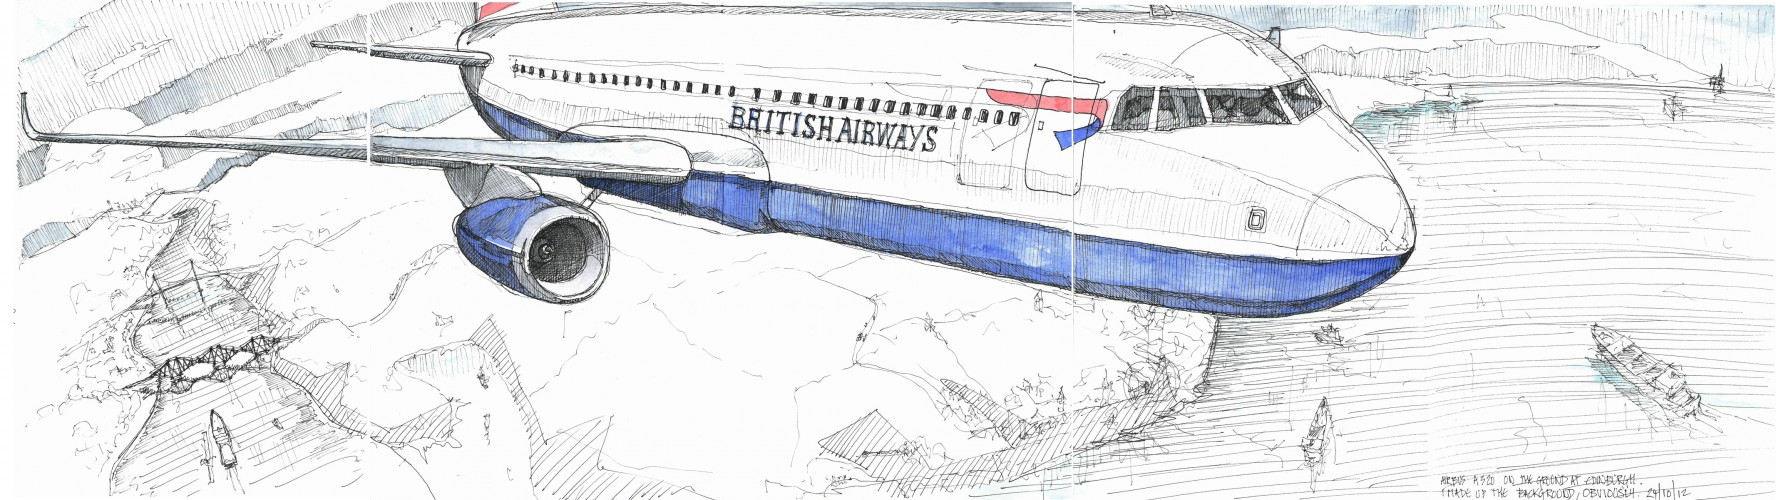 plane at edinburgh airport